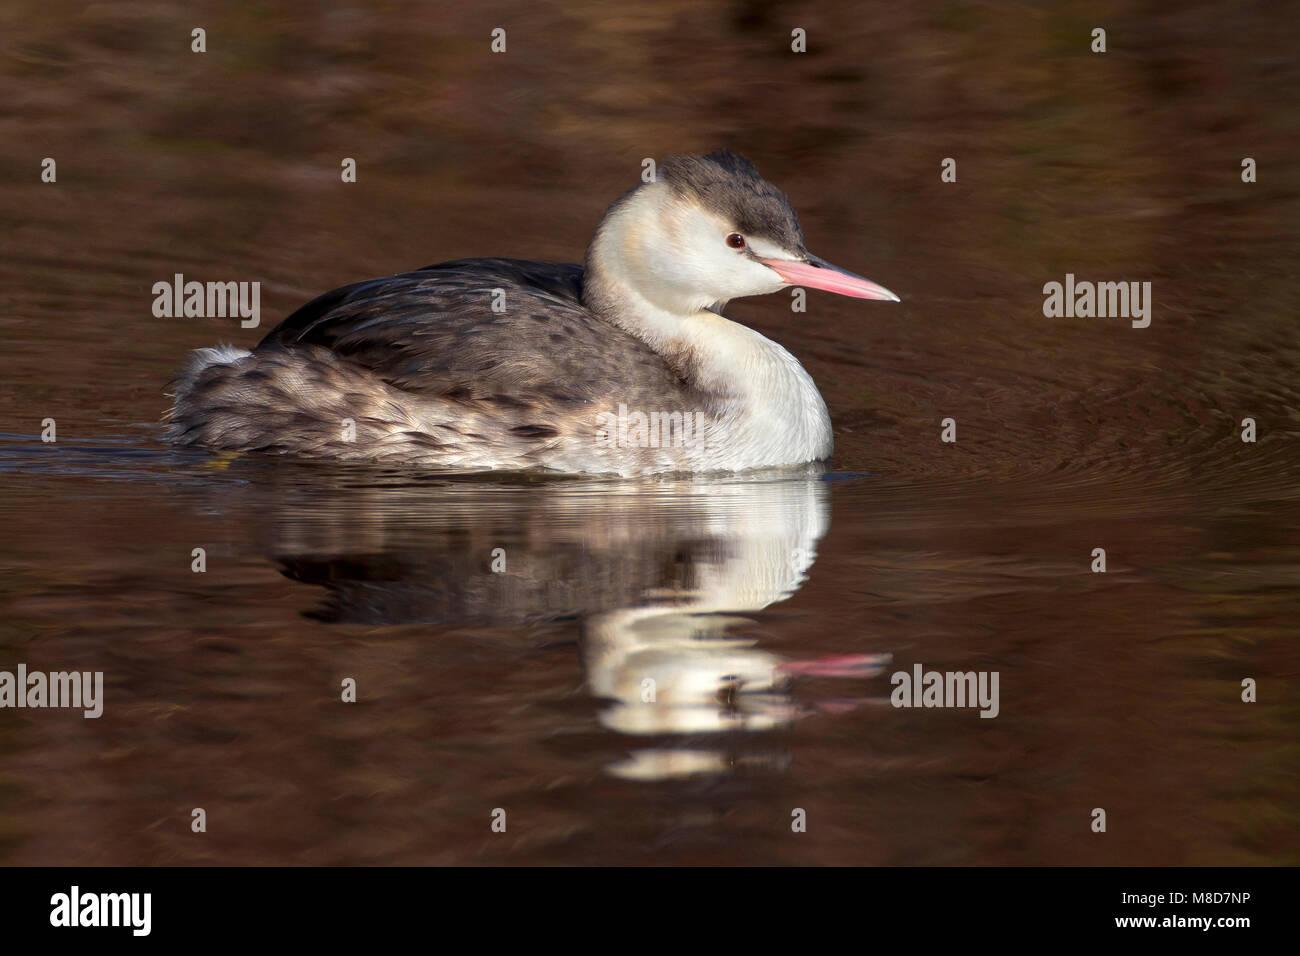 Zwemmende Fuut in winterkleed, Swimming Great Crested Grebe in winterplumage Stock Photo